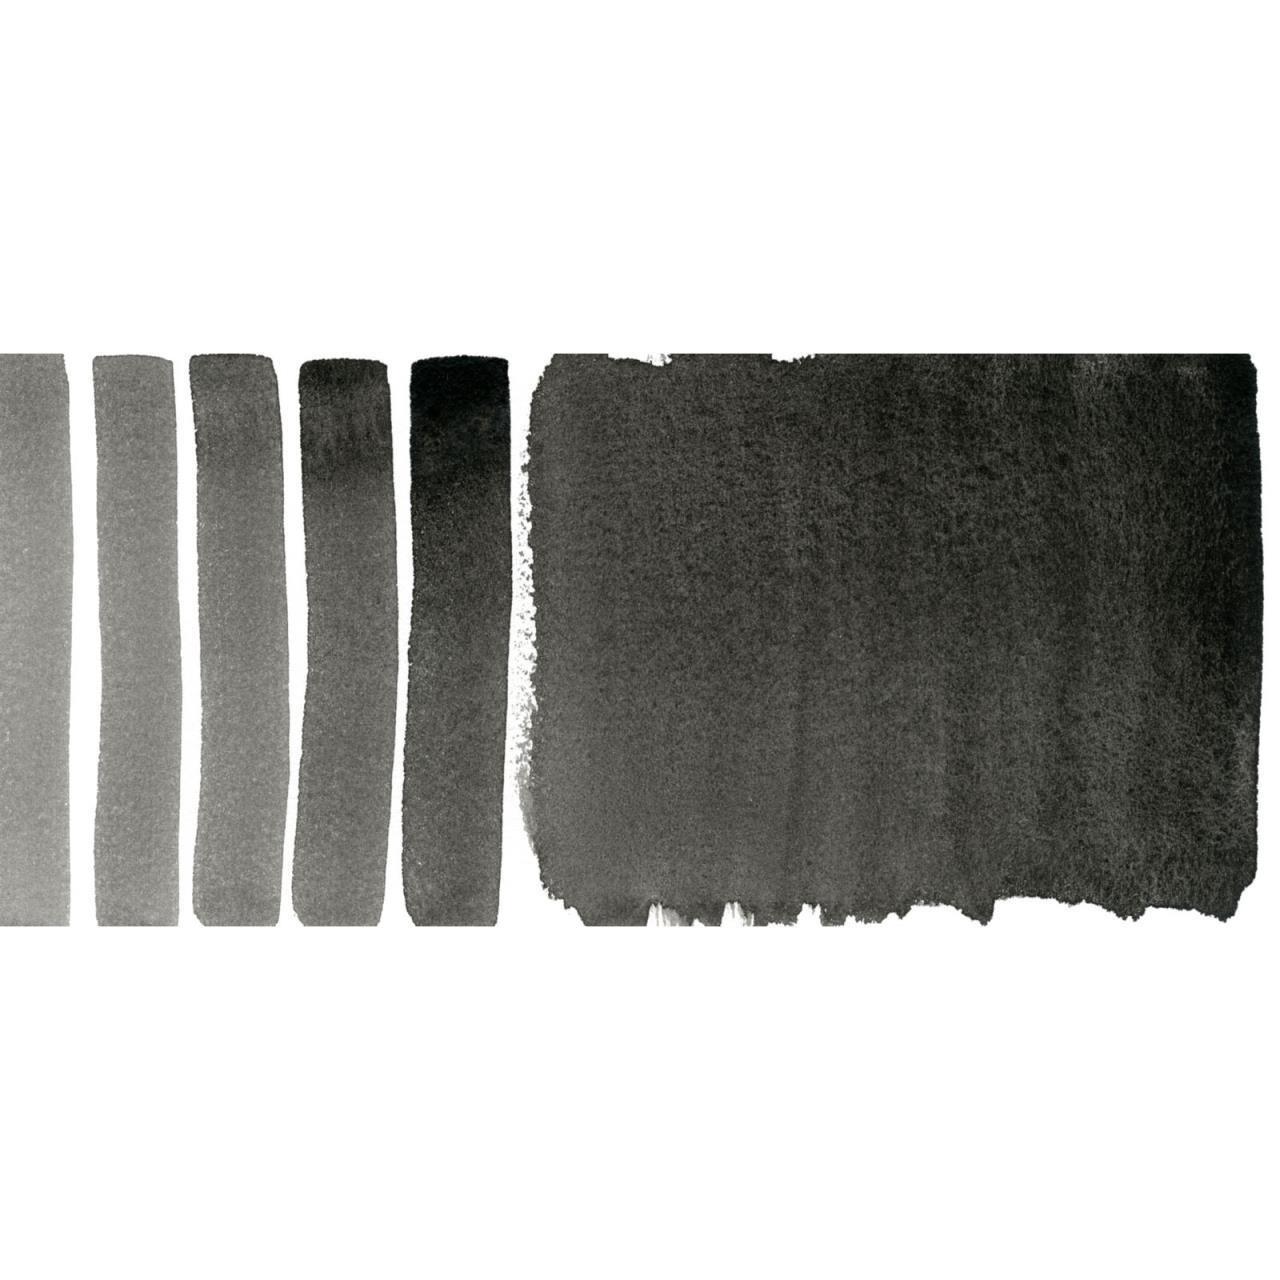 DANIEL SMITH Extra Fine Watercolors 15ml Tubes, Ivory Black - 743162009022